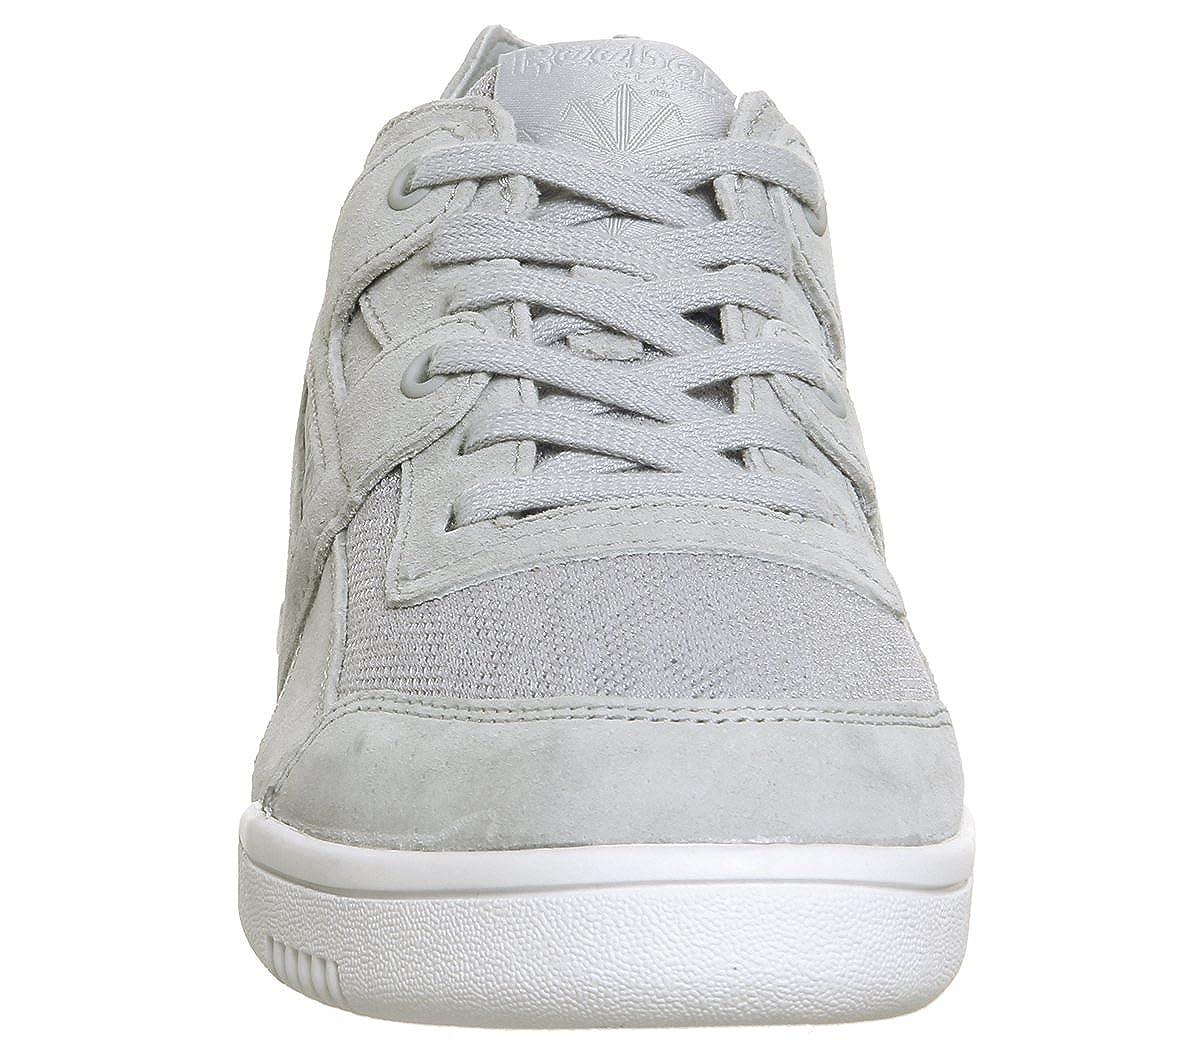 231b29e092b Reebok Women s Workout Lo Plus Fbt Trainers  Amazon.co.uk  Shoes   Bags